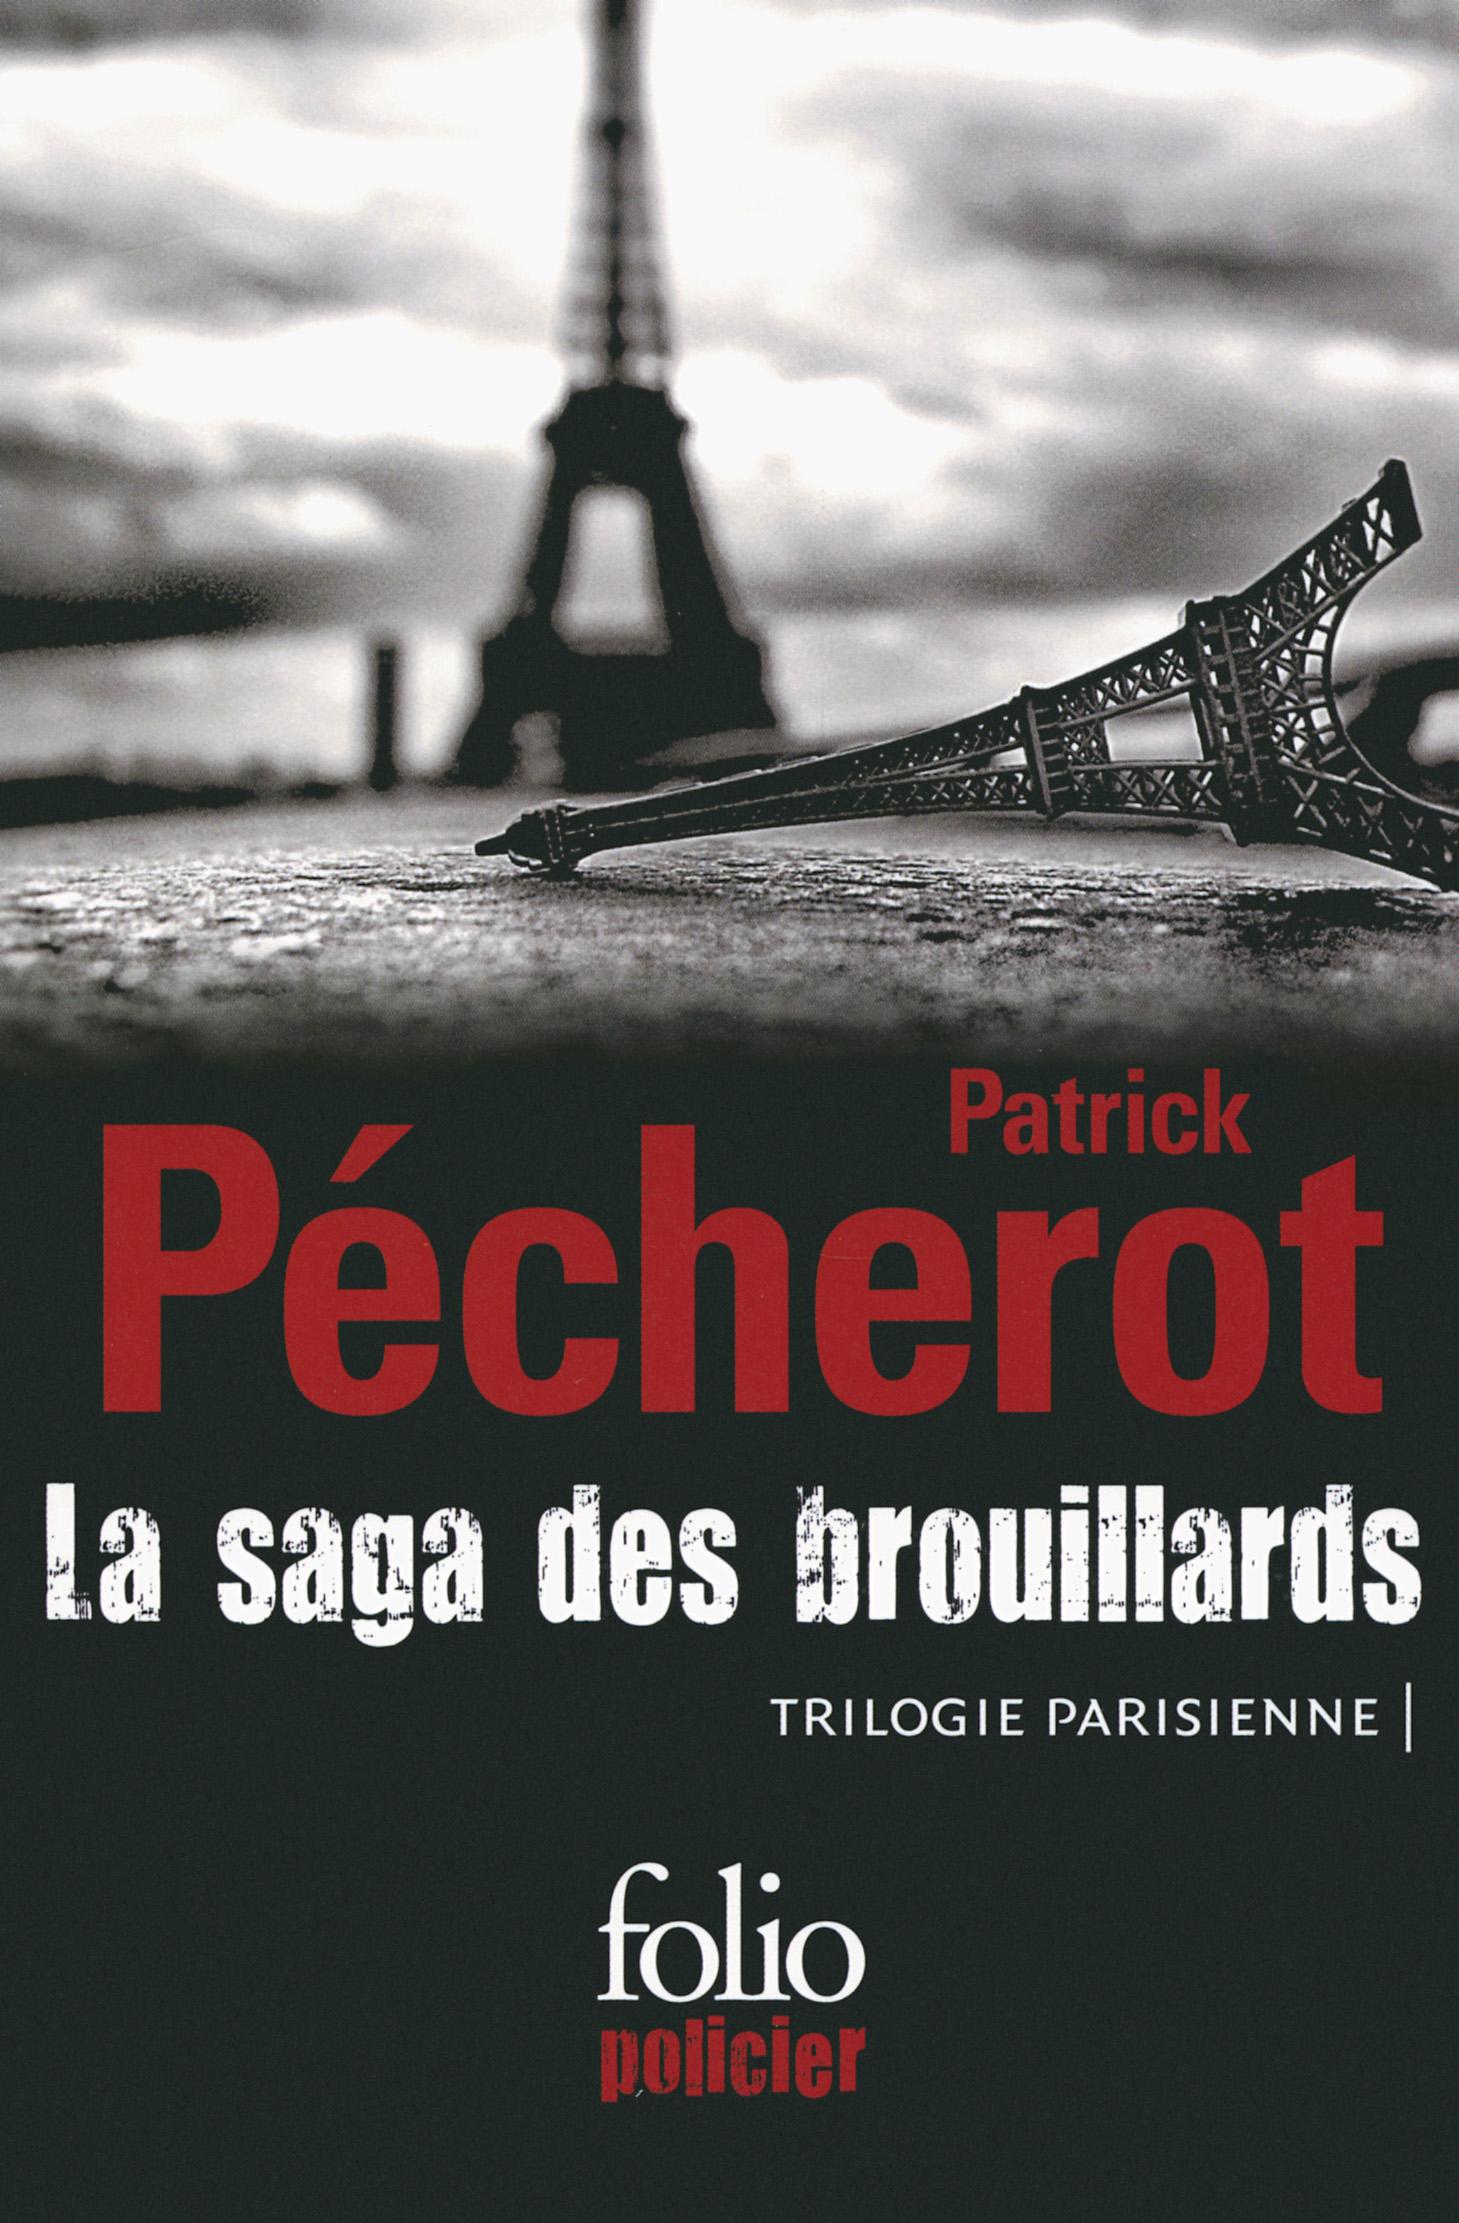 La saga des brouillards (Trilogie parisienne)